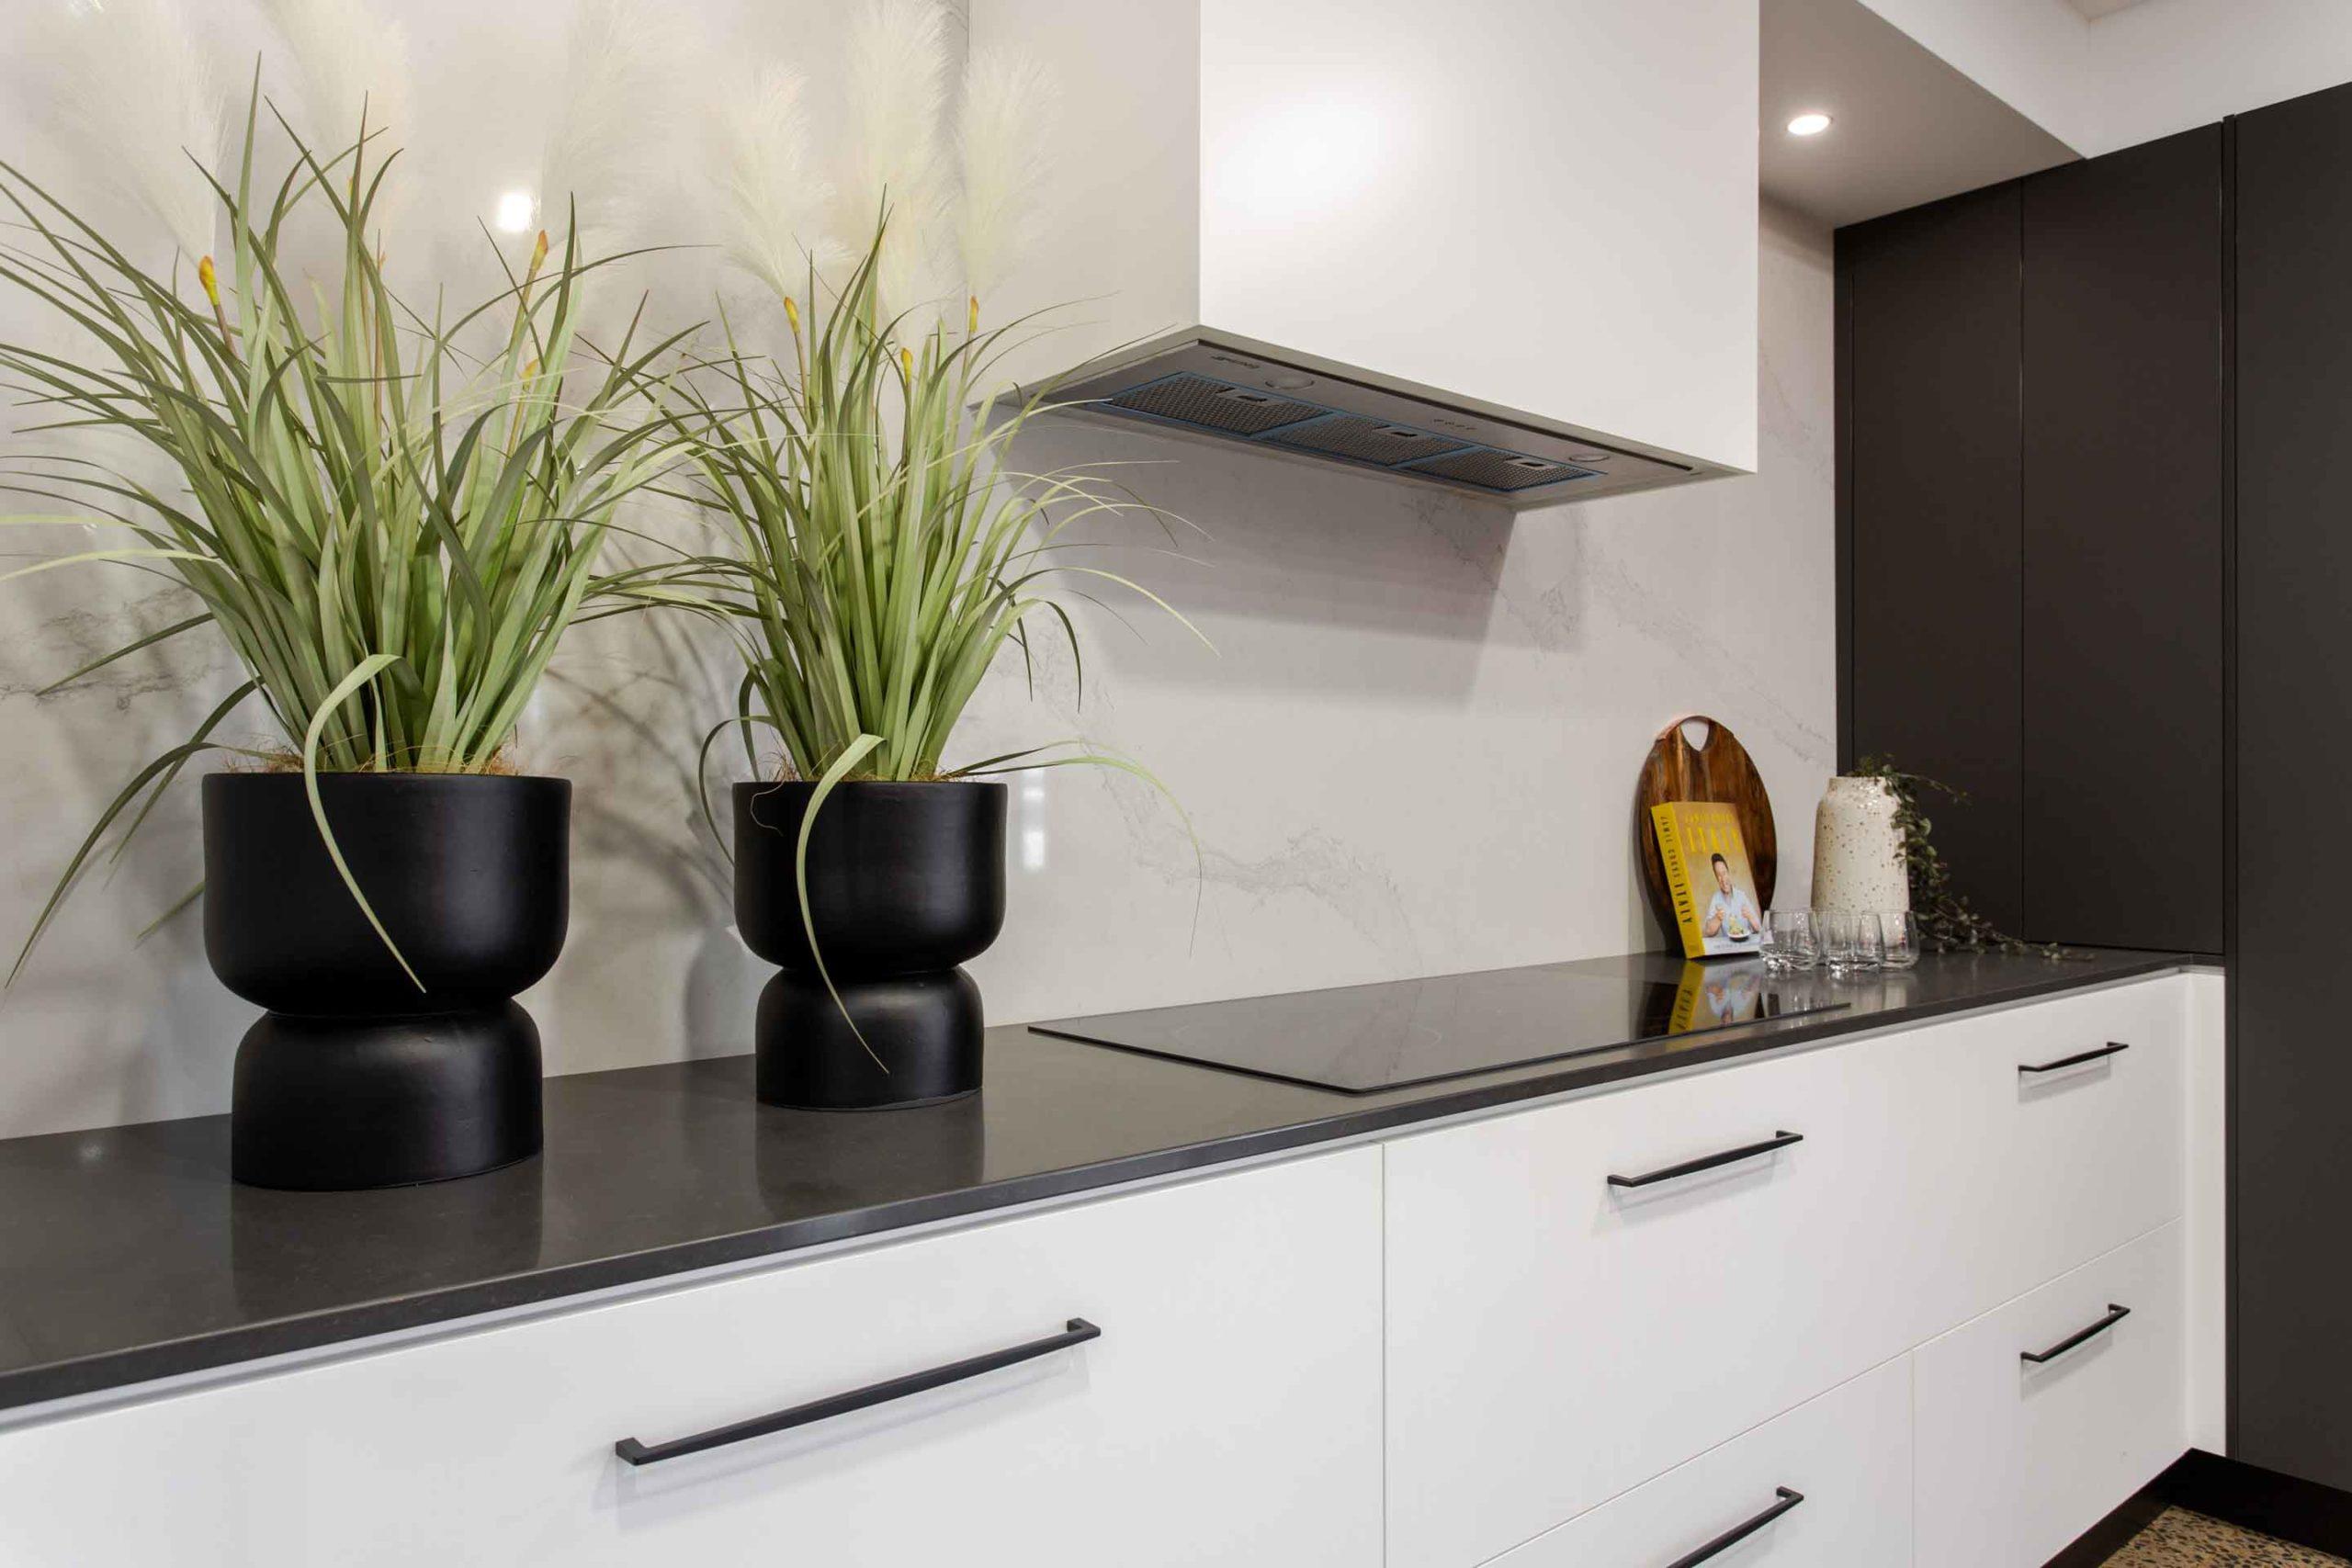 Leopard_Lens_Photography_Inarc_Design_Simson_Kitchen_Showroom-14